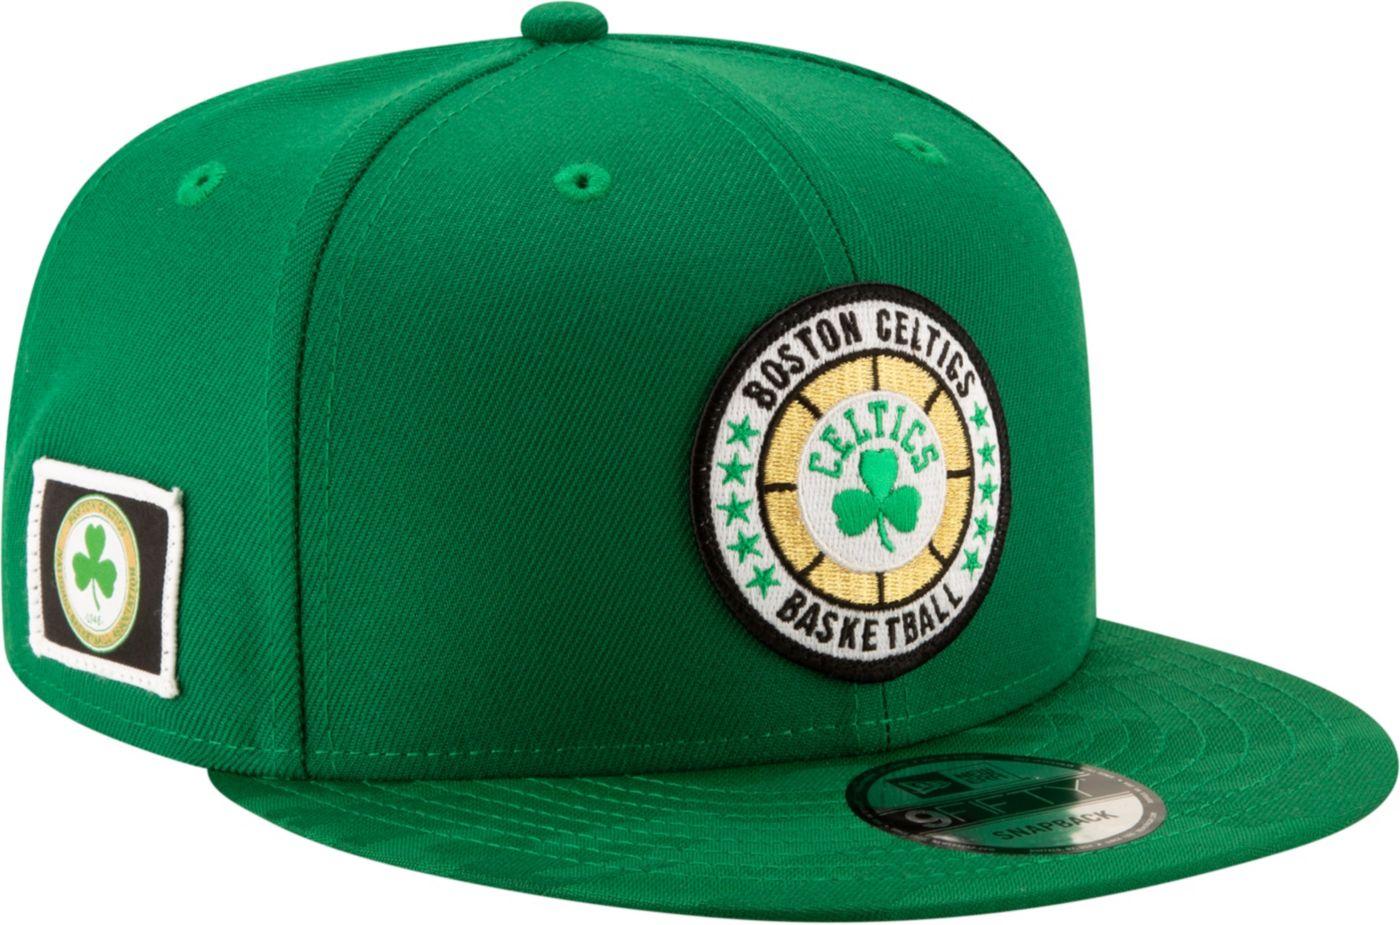 New Era Men's Boston Celtics 9Fifty On-Court Adjustable Snapback Hat